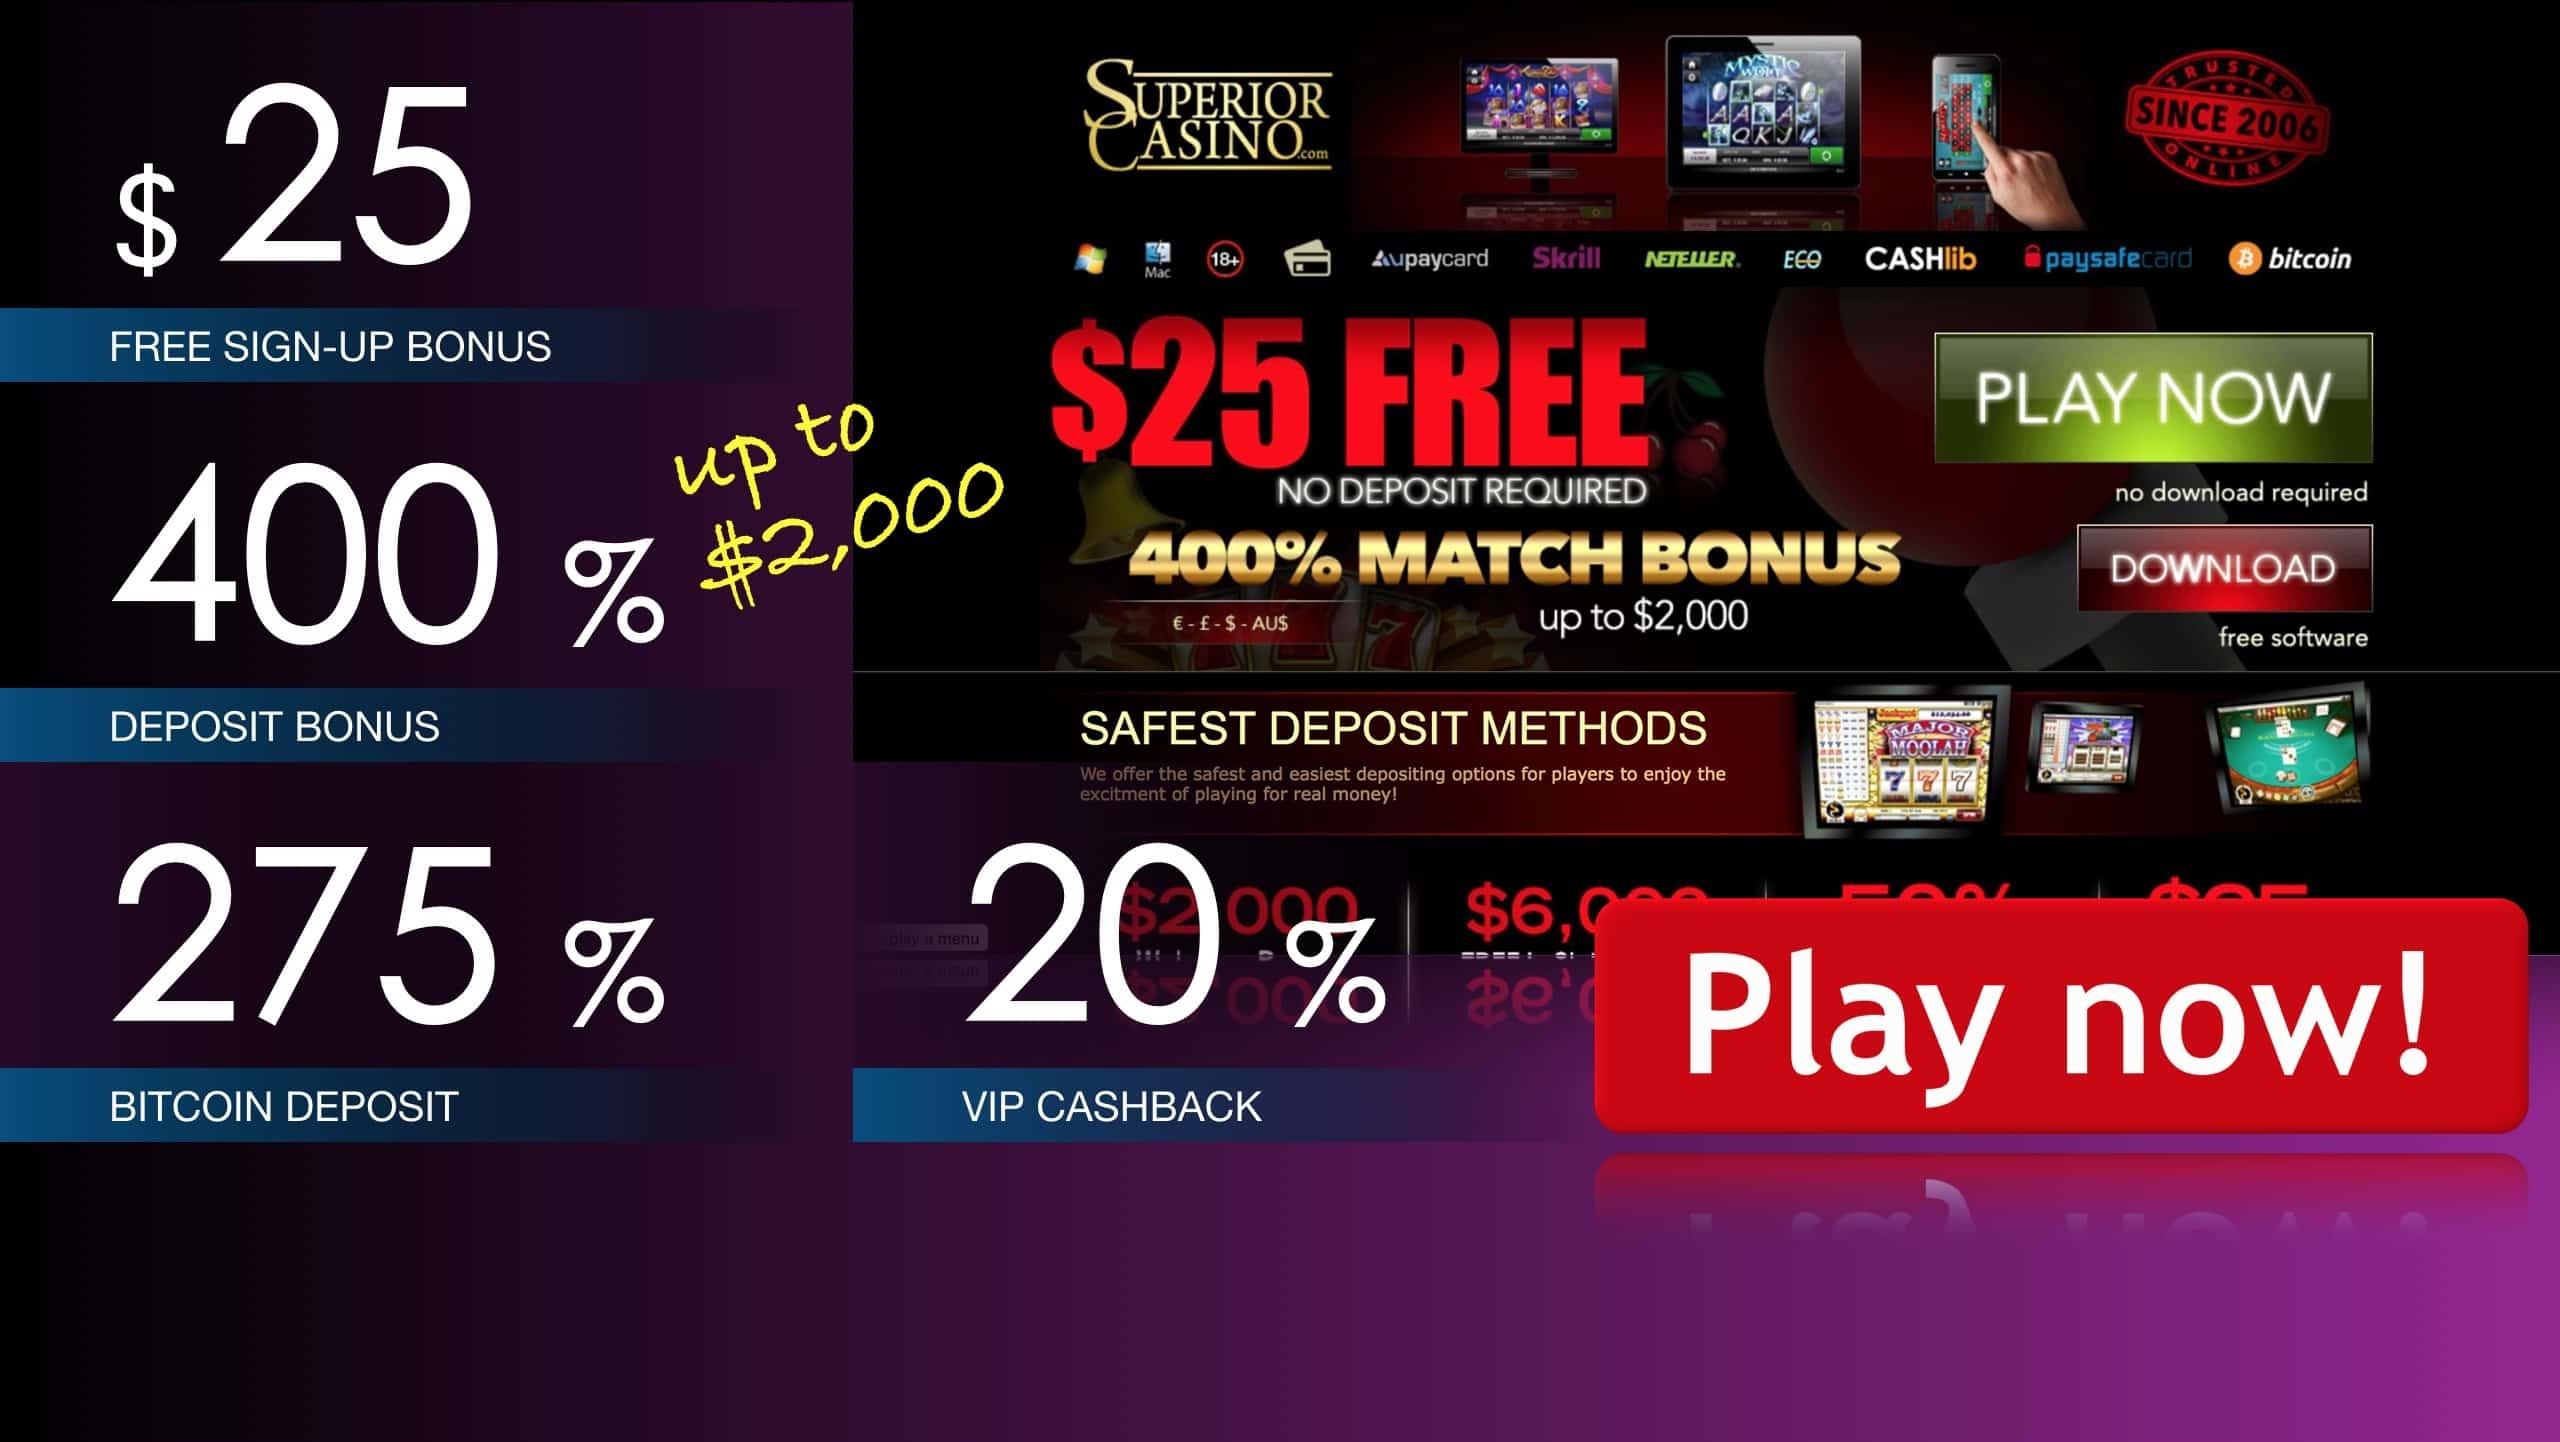 Big casino codice bonus